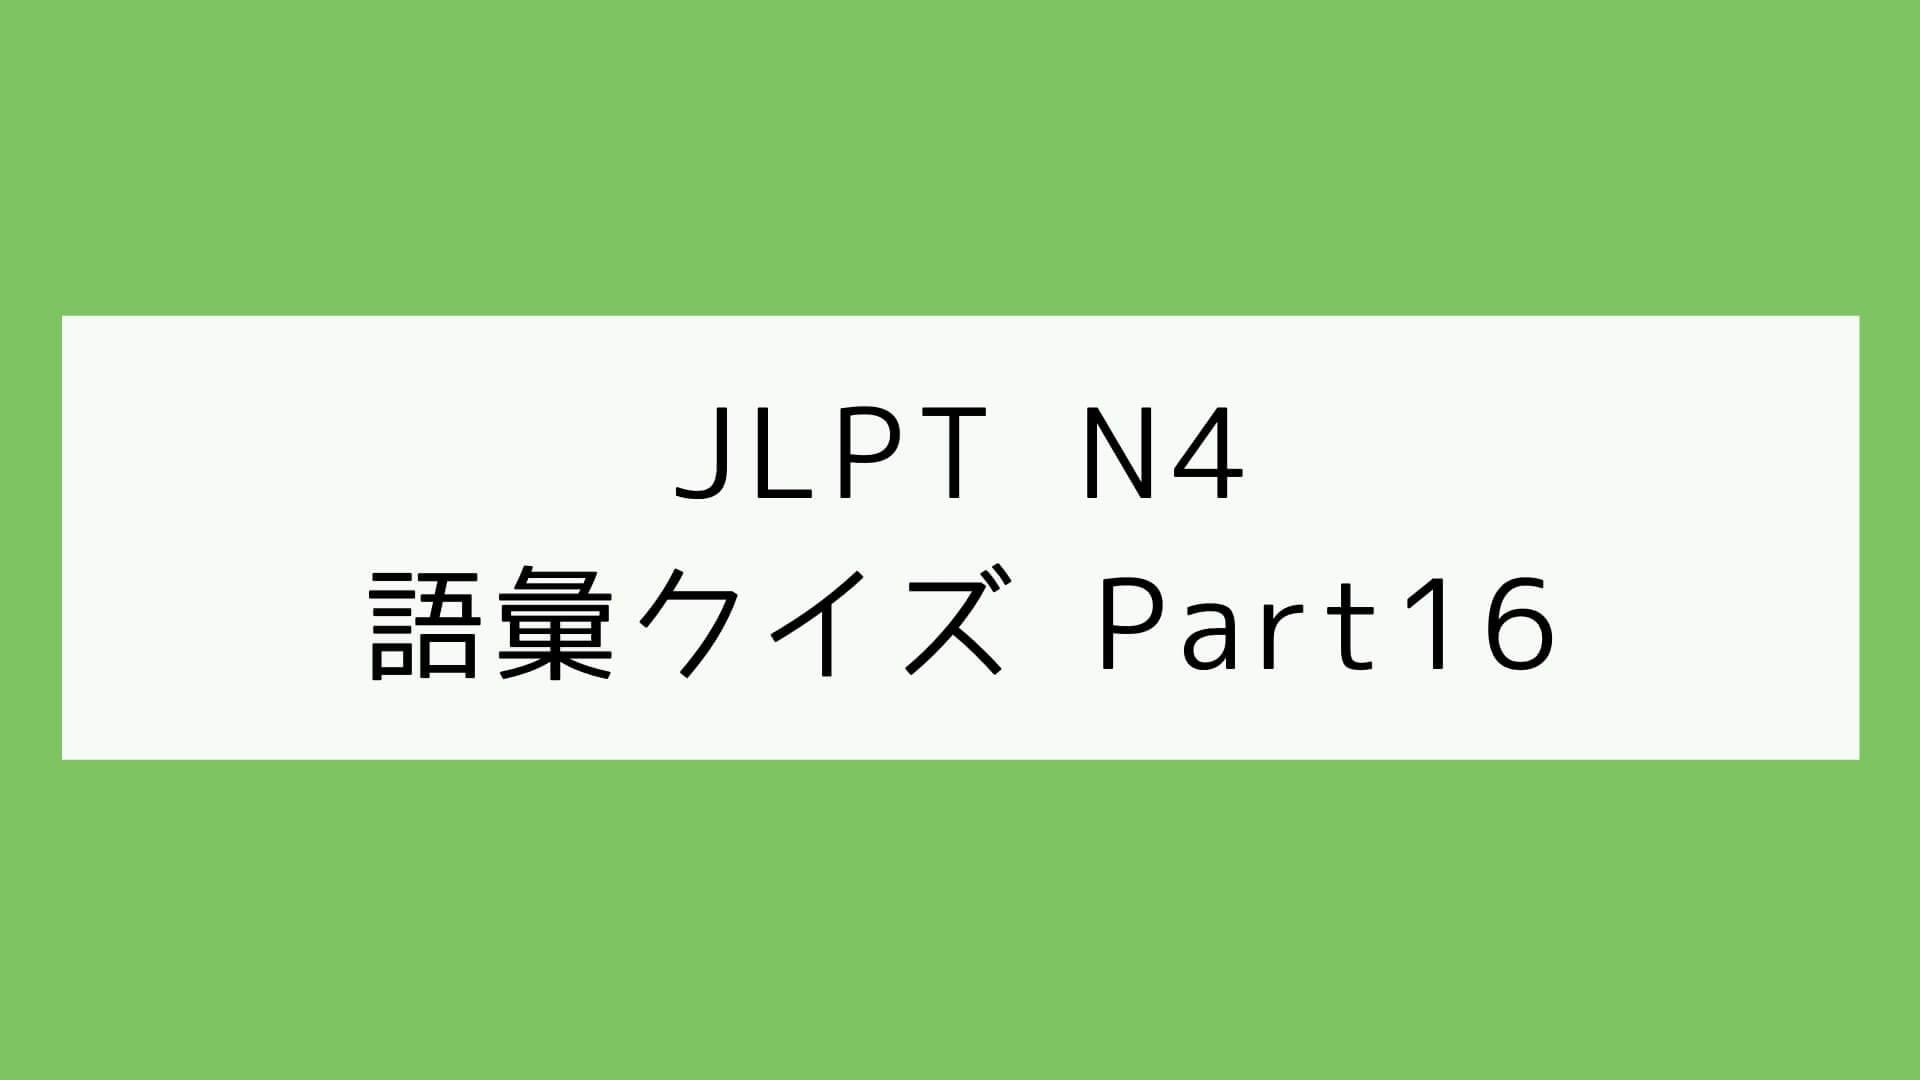 【JLPT N4】語彙クイズ Part16